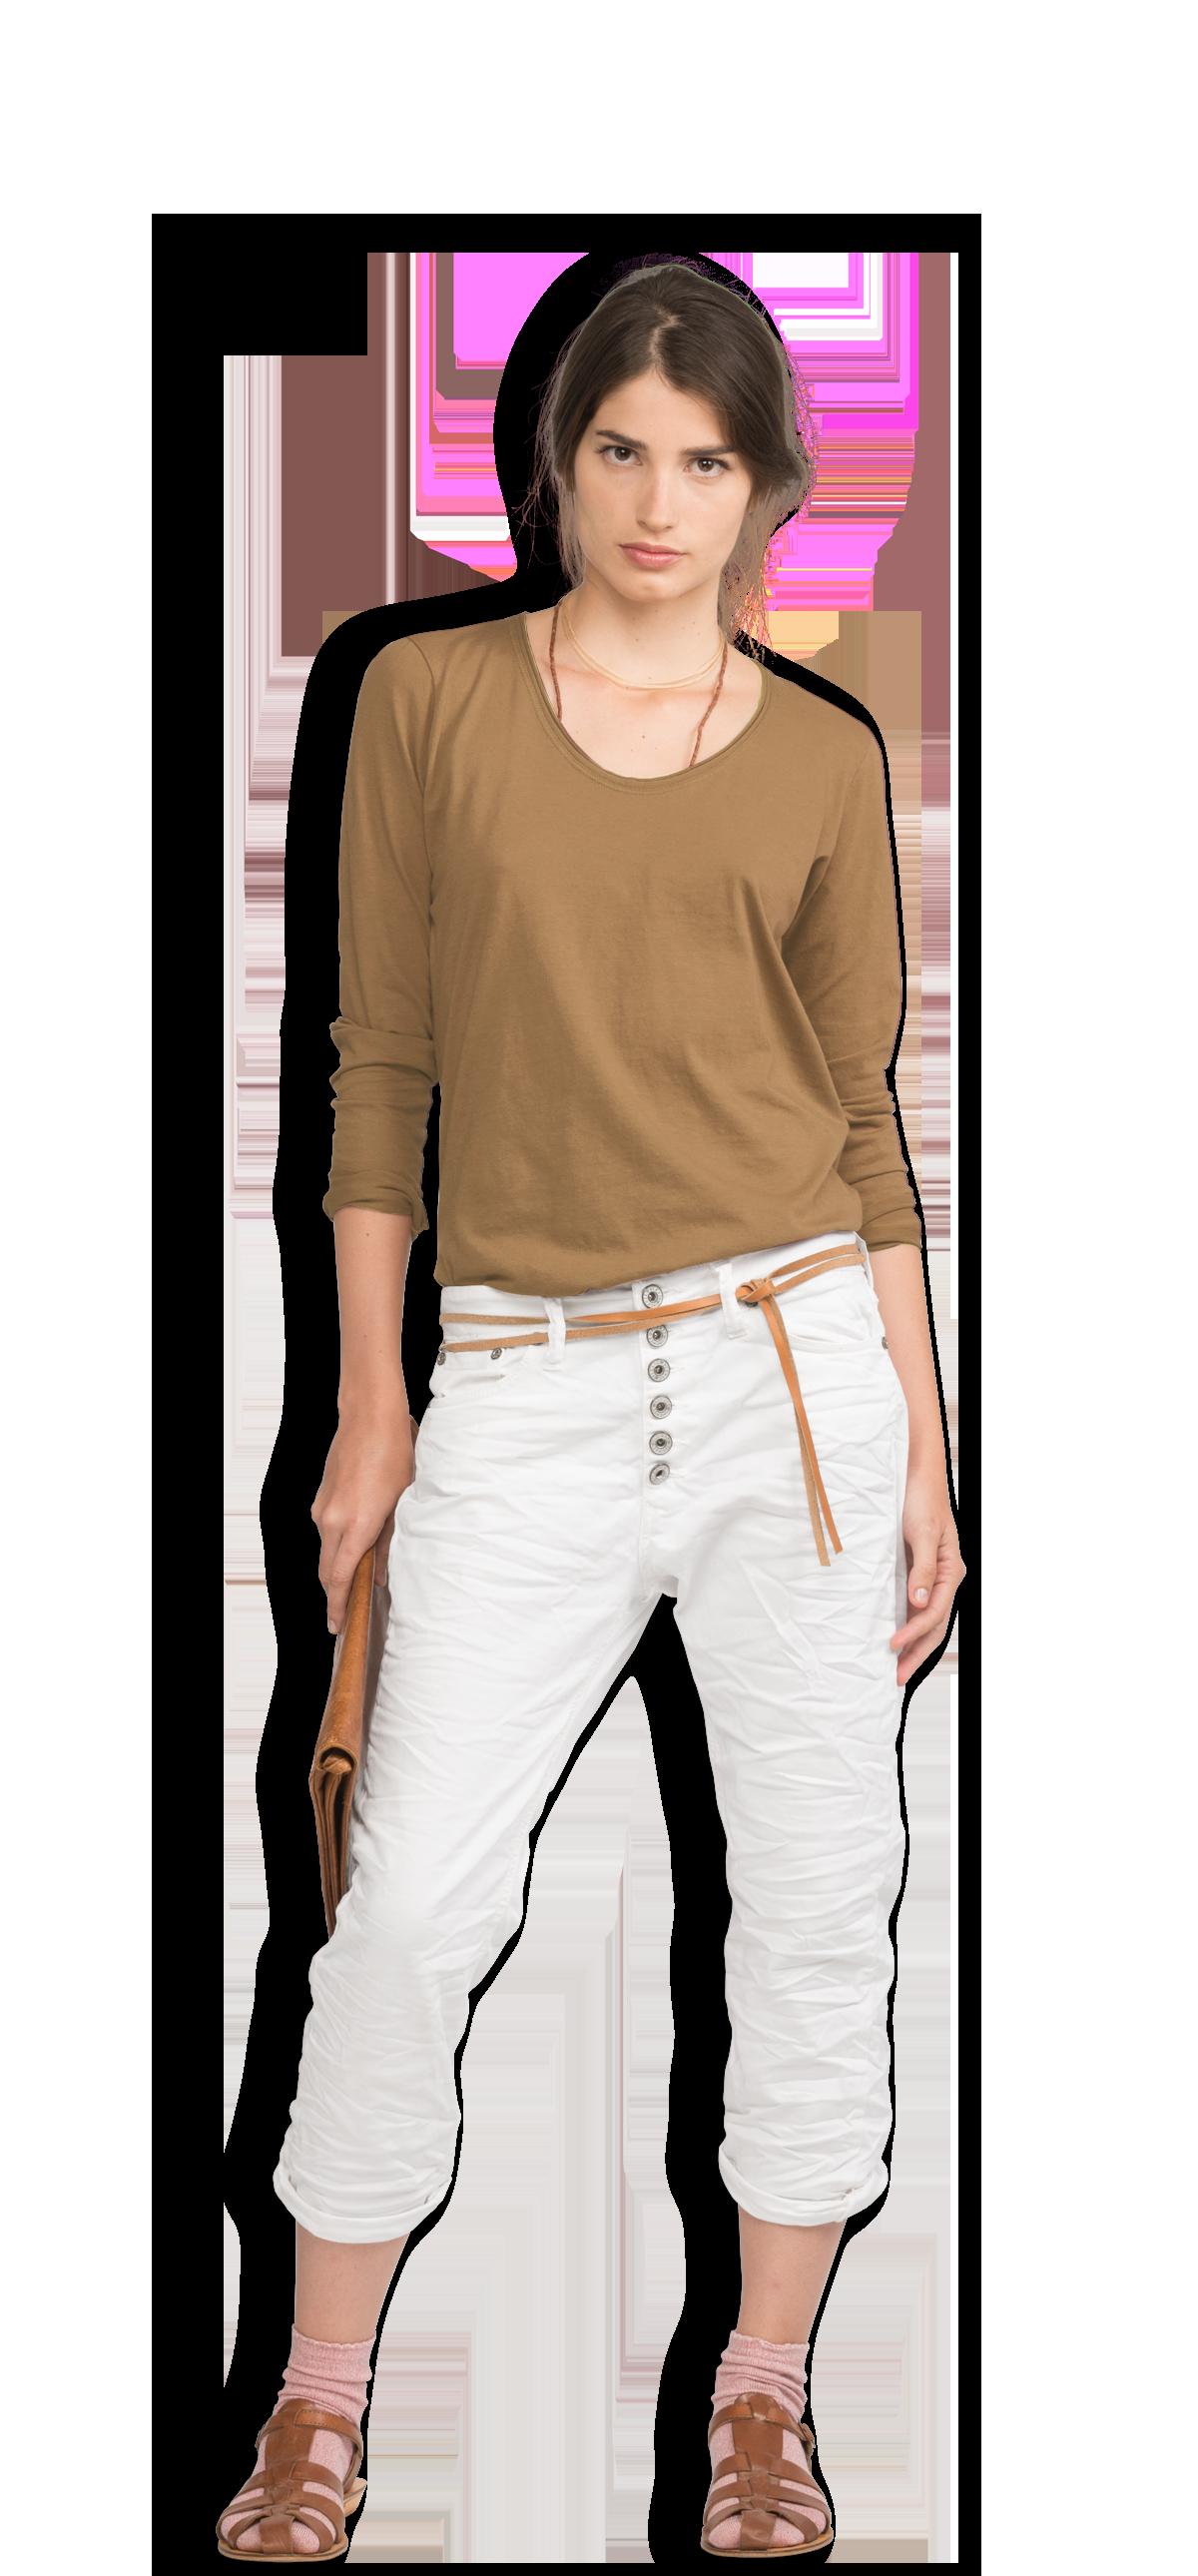 Neushop Women s Eero 100% Cotton Long Sleeve Premium T-Shirt 1a6630af81